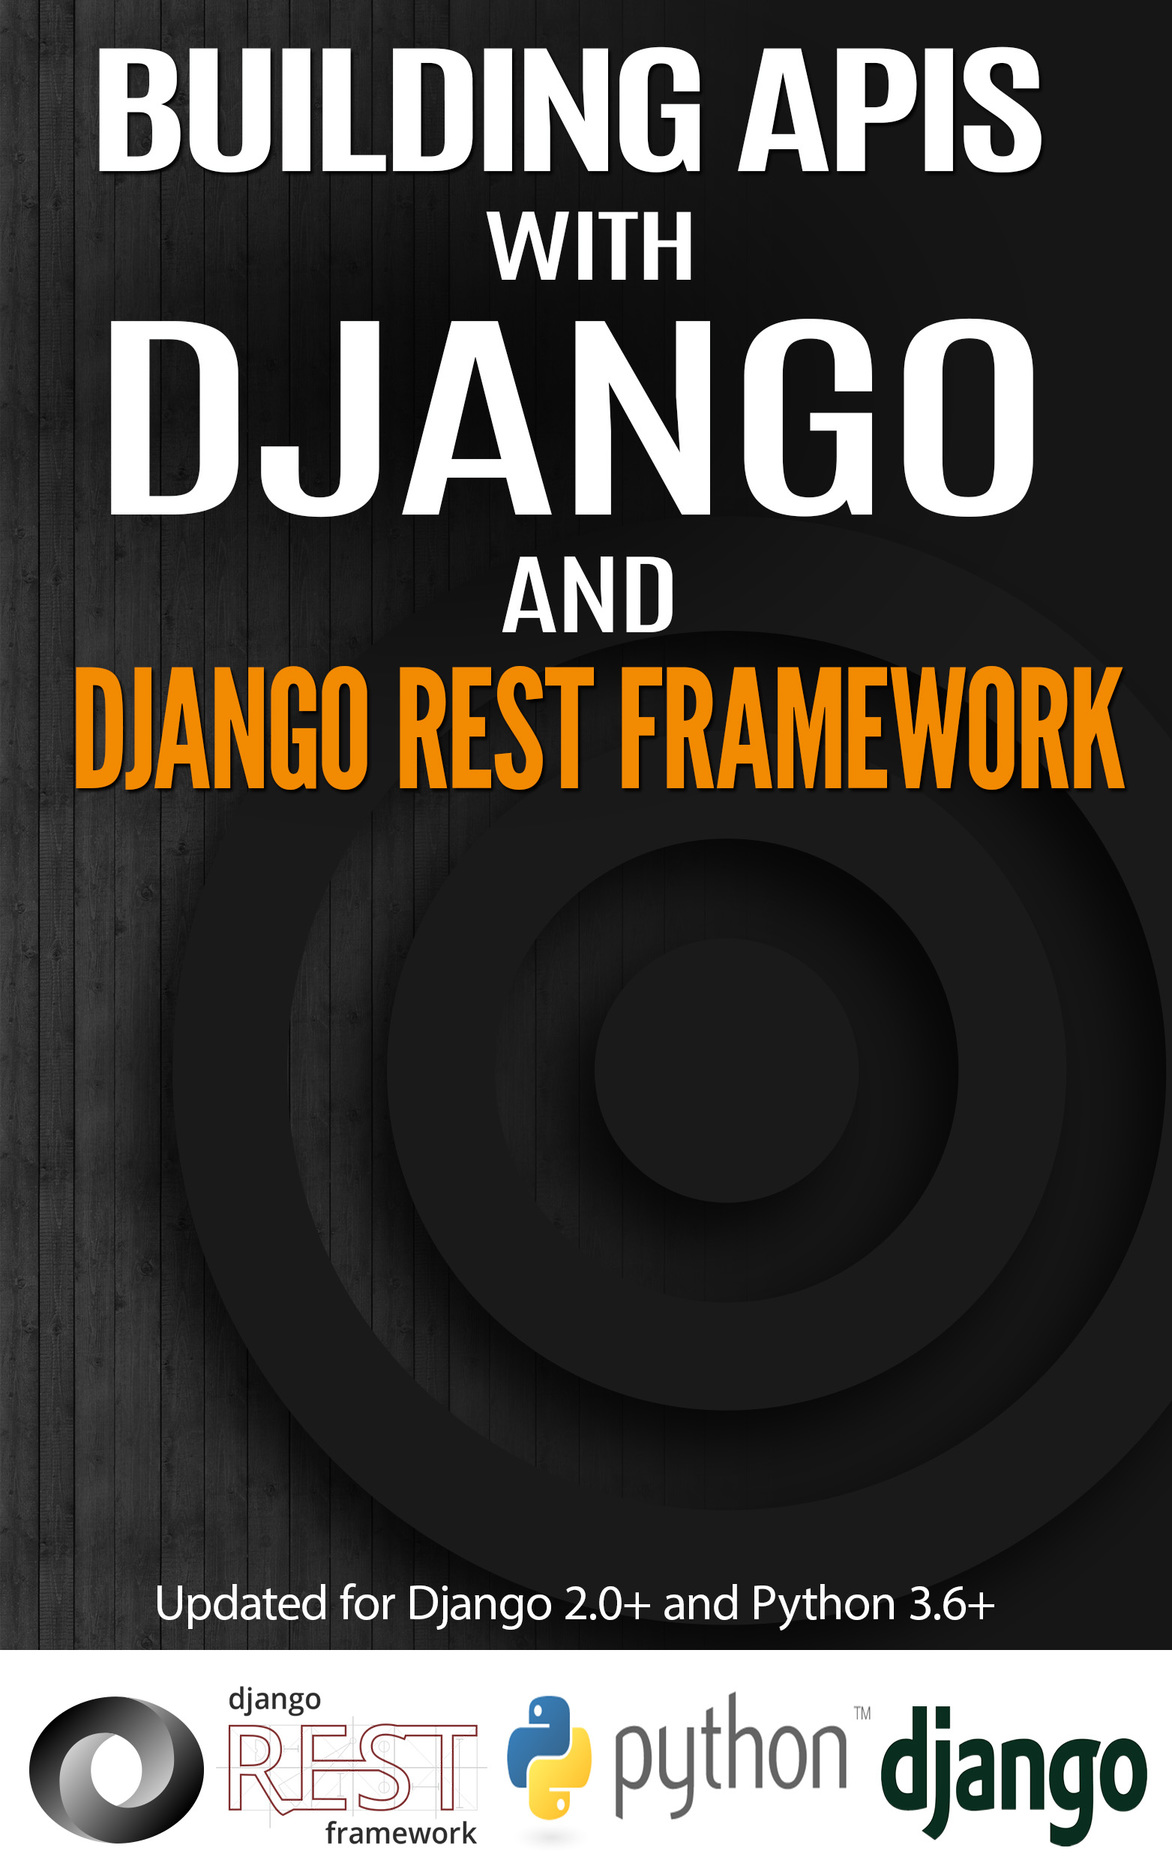 Book Cover Images Api : Building apis with django and rest framework